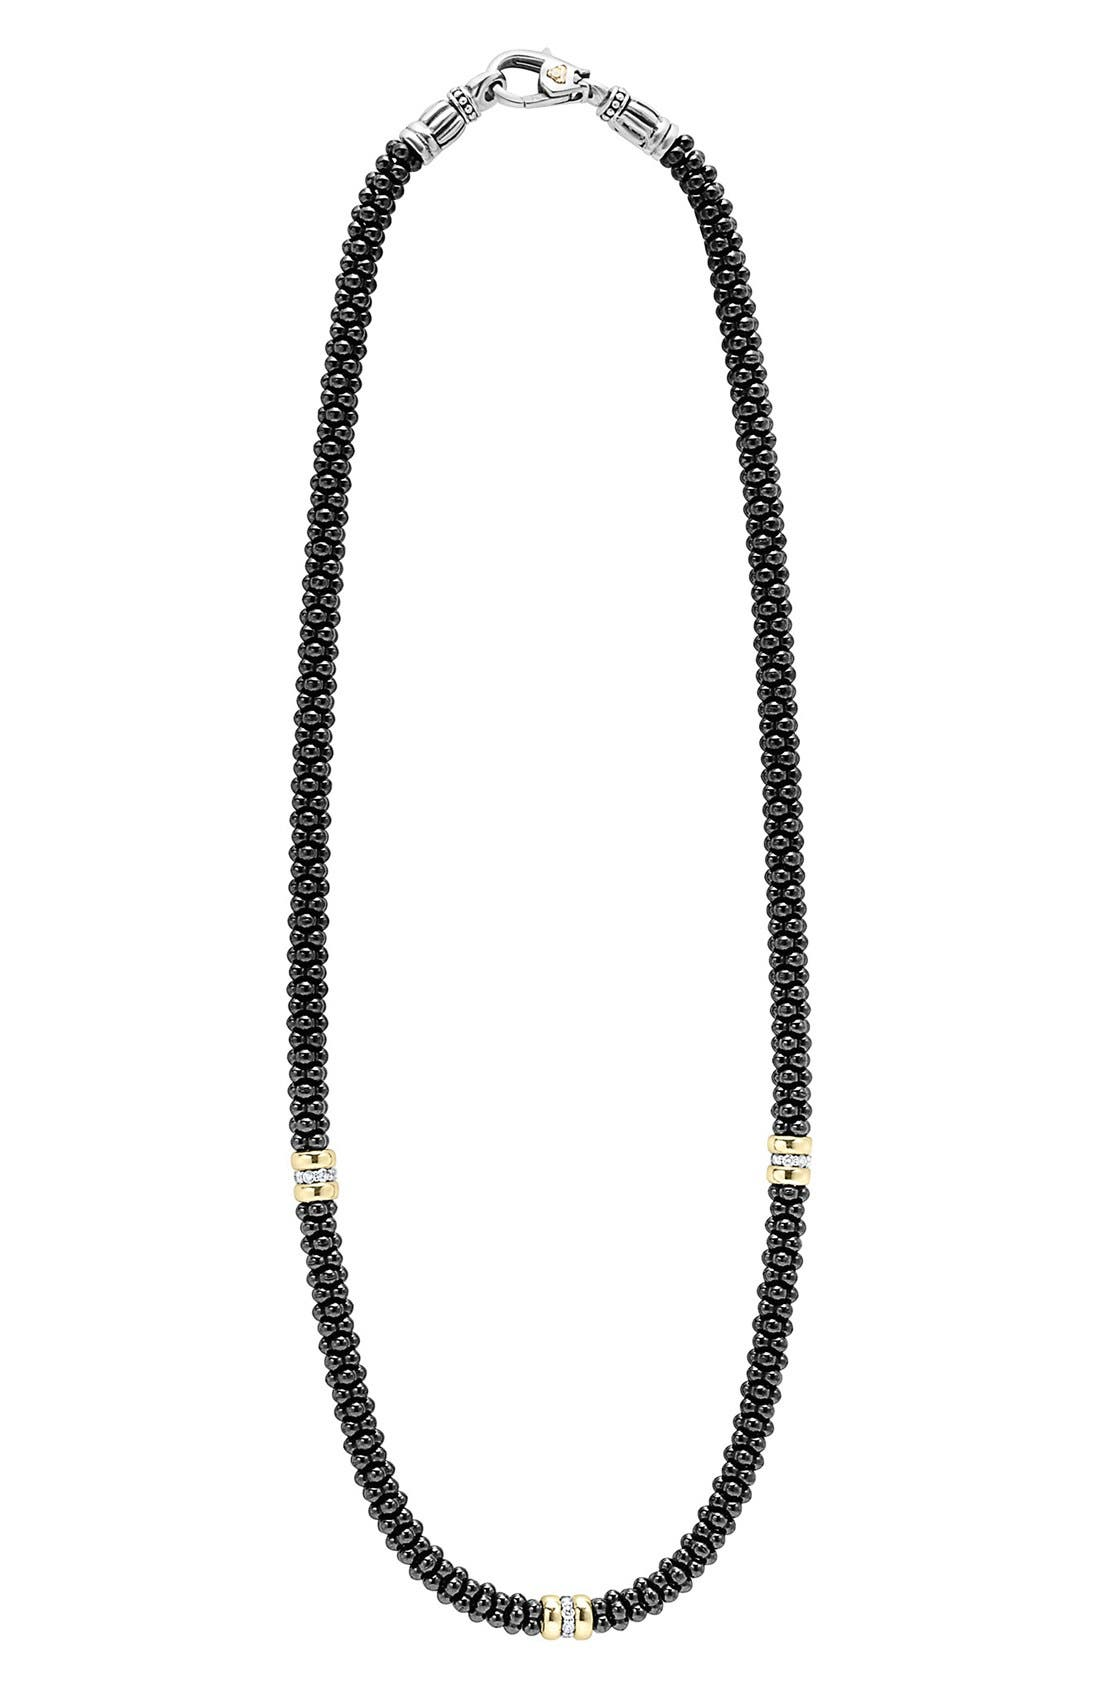 LAGOS 'Black Caviar' Station Necklace